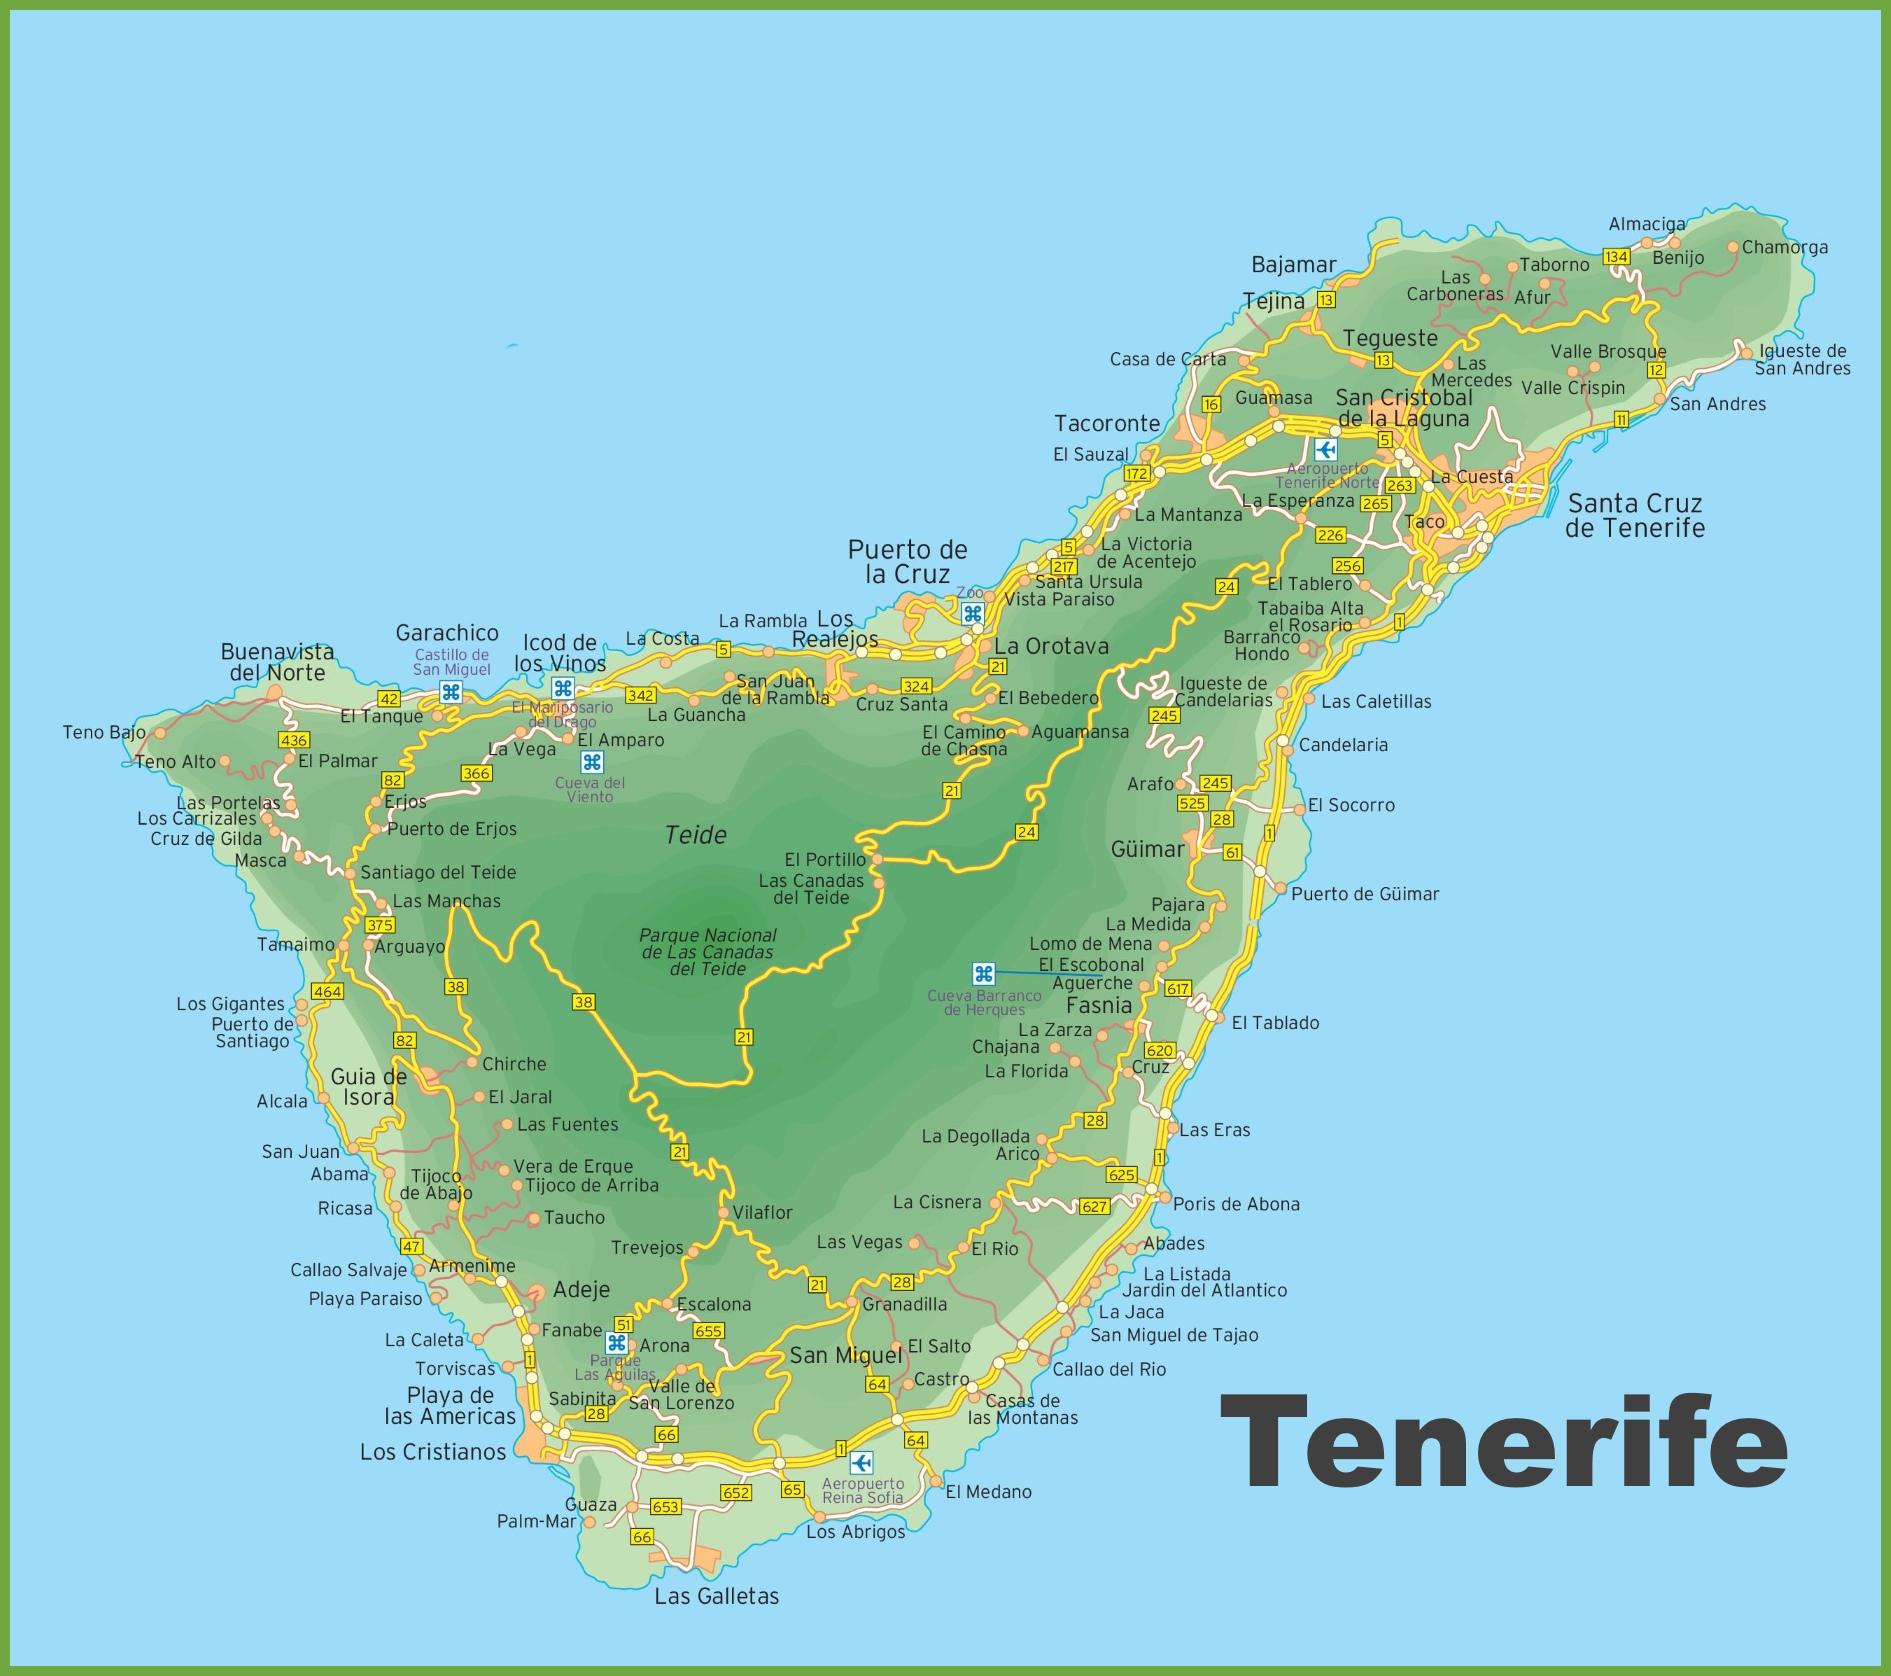 Tenerife On Map Map of Tenerife island Tenerife On Map